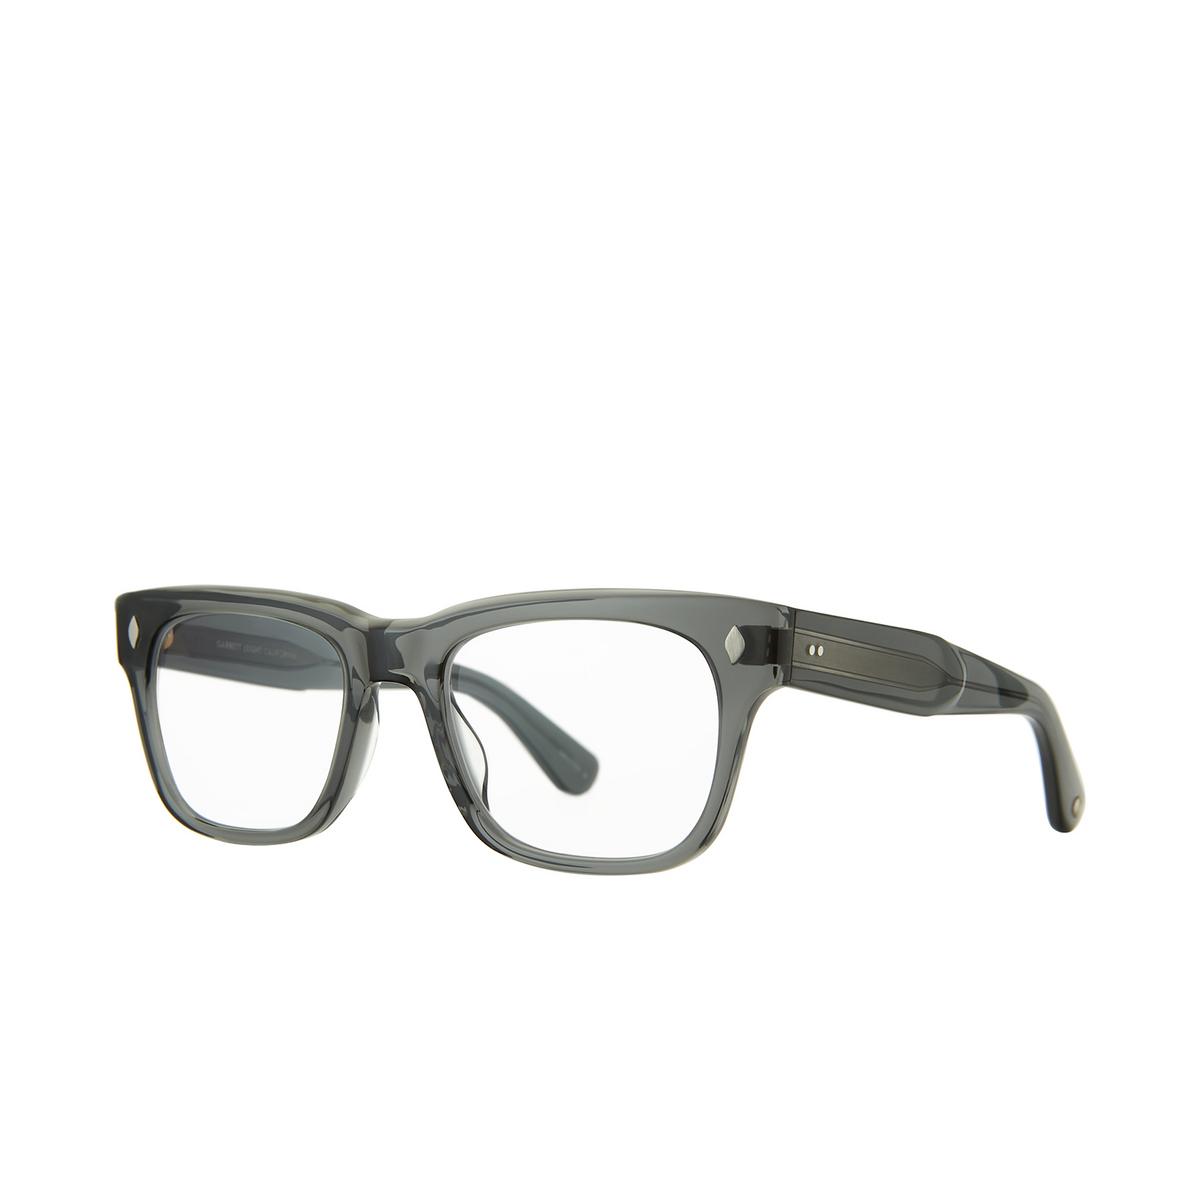 Garrett Leight® Square Eyeglasses: Troubadour color Sea Grey Sgy - three-quarters view.